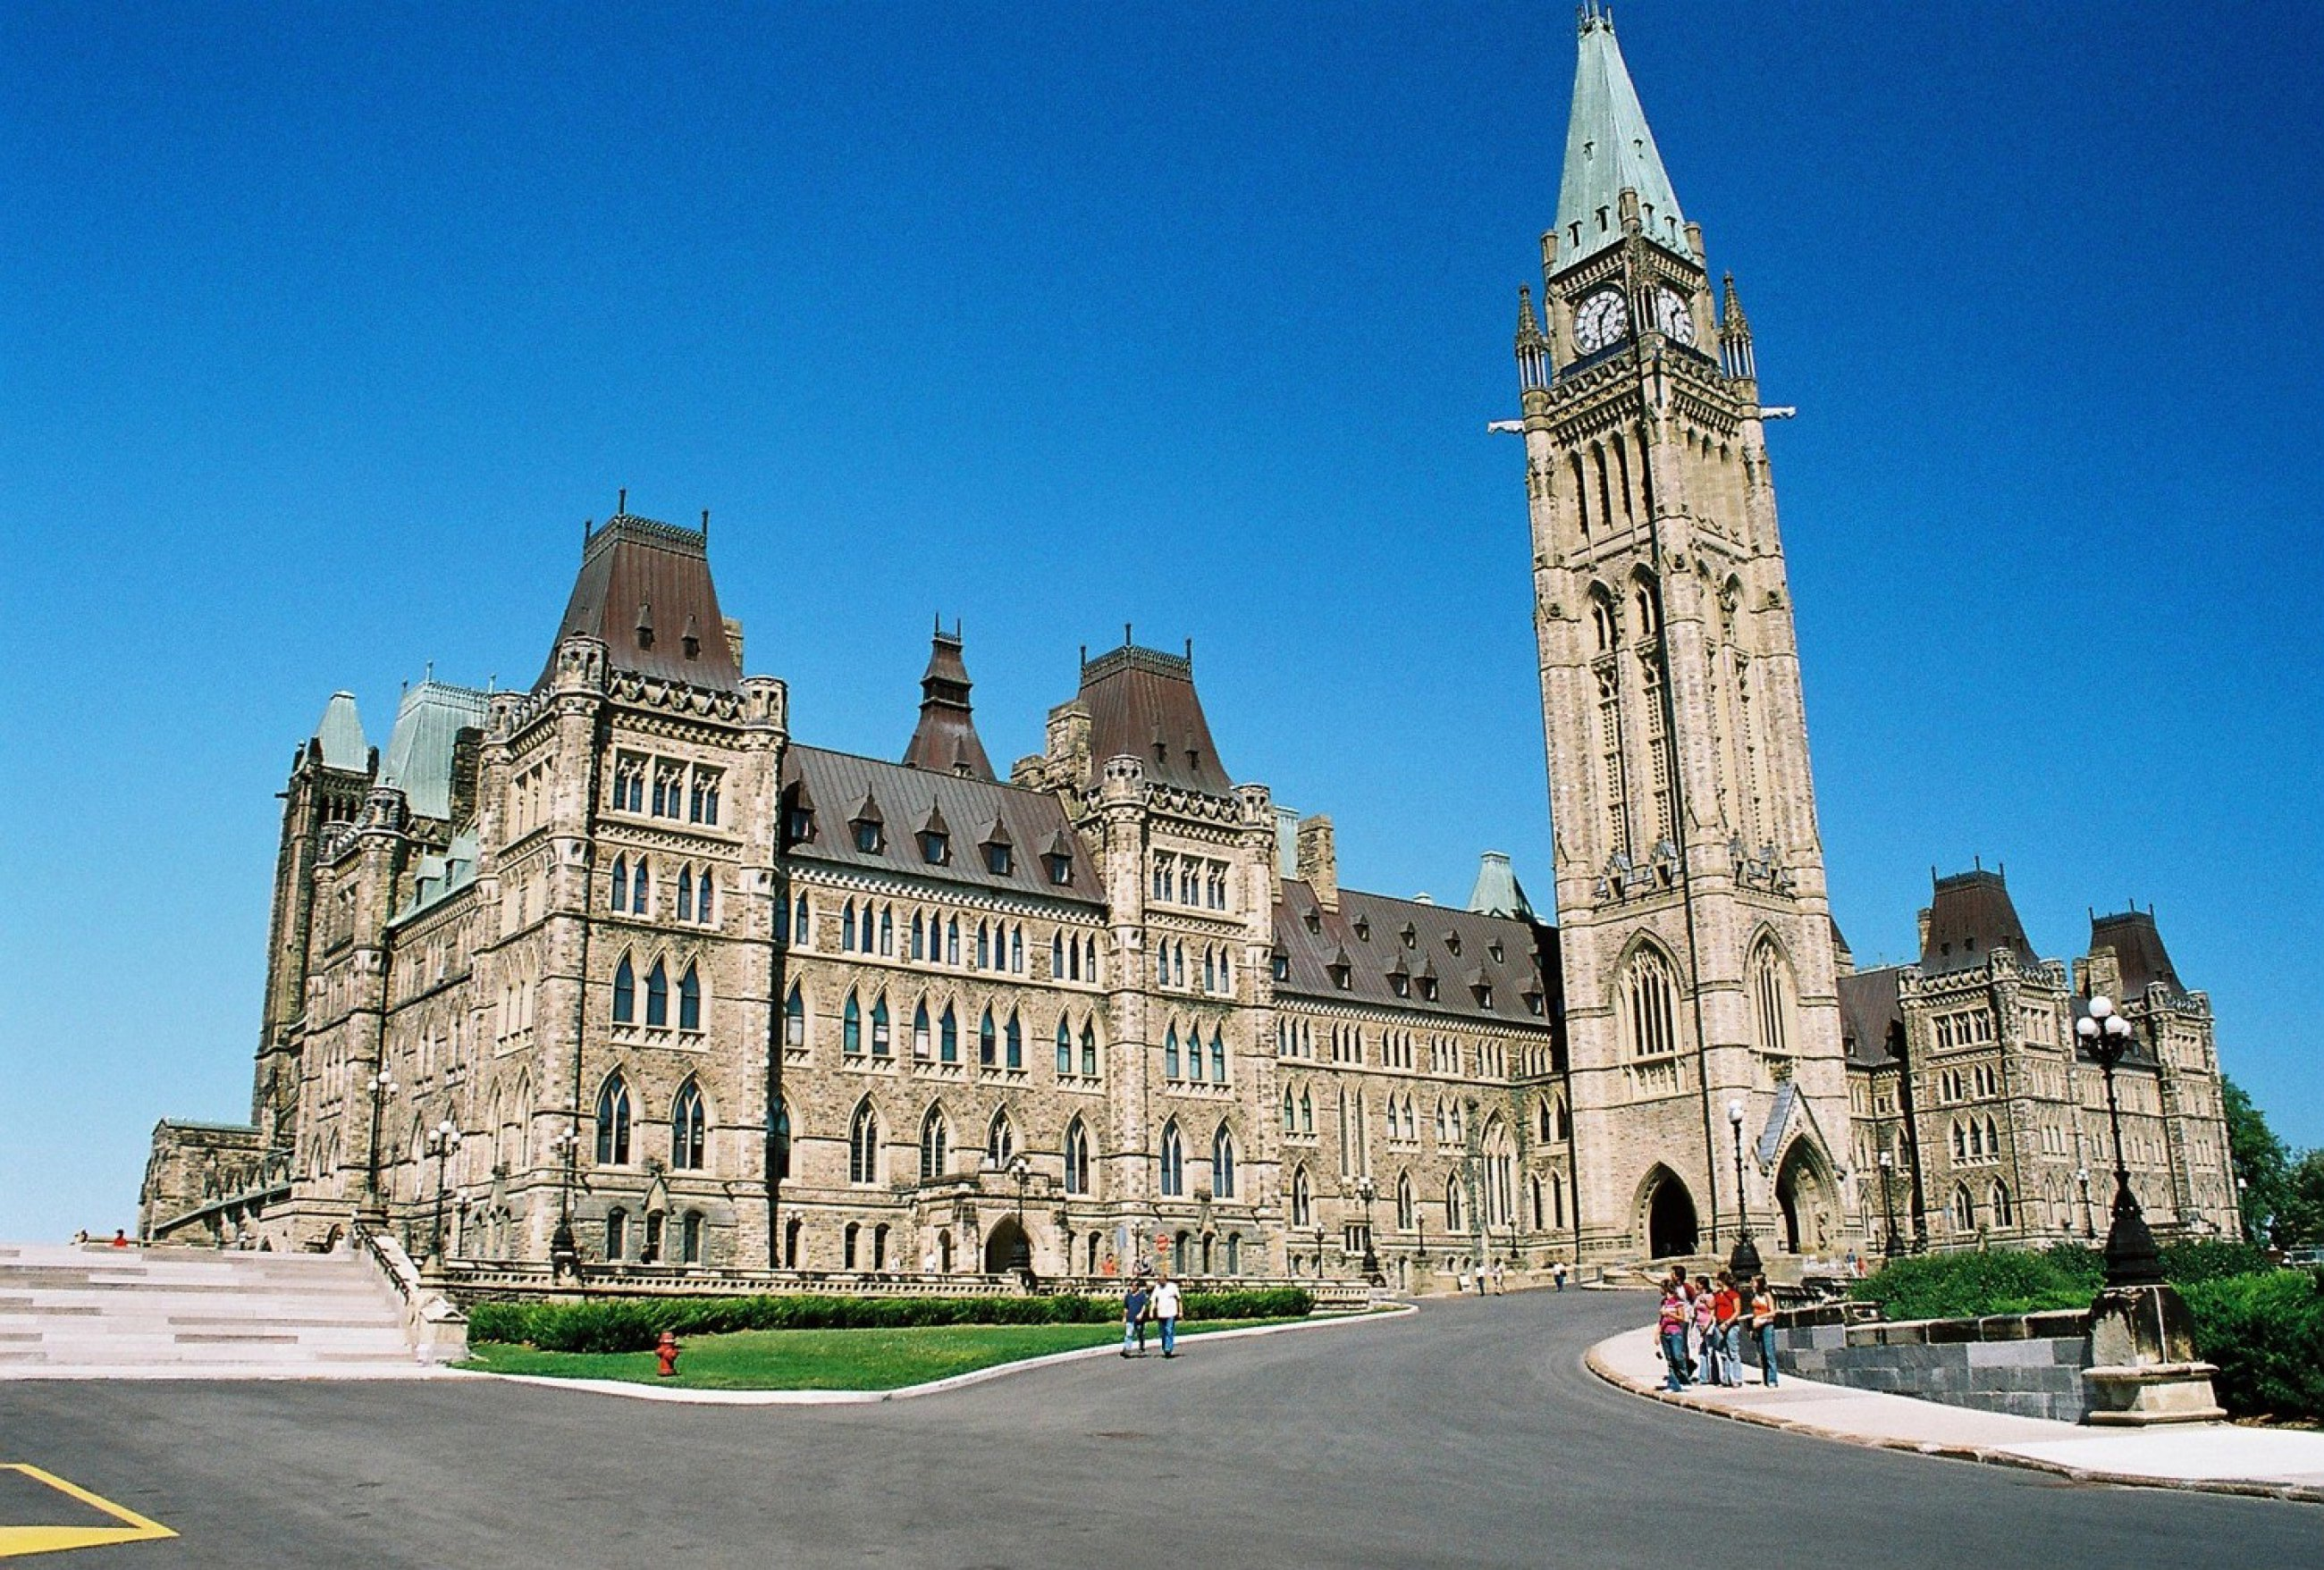 https://bubo.sk/uploads/galleries/7322/kanadsky-parlament-v-ottawe-iny-zaber-ako-z-minuleho-roku.jpg